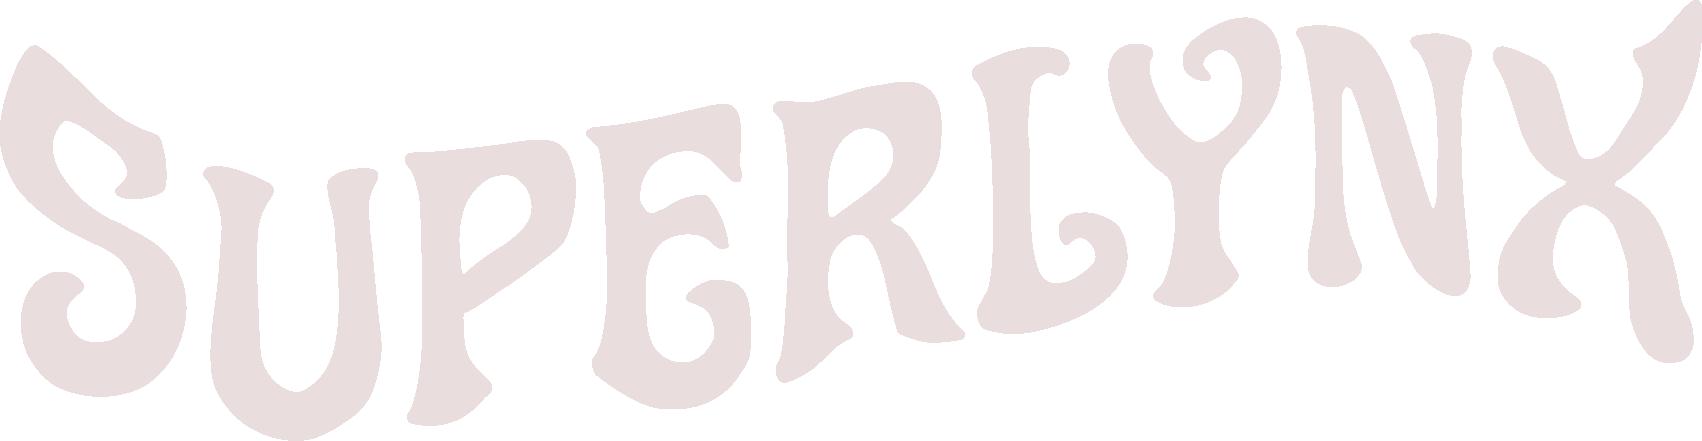 SUPERLYNX - logo